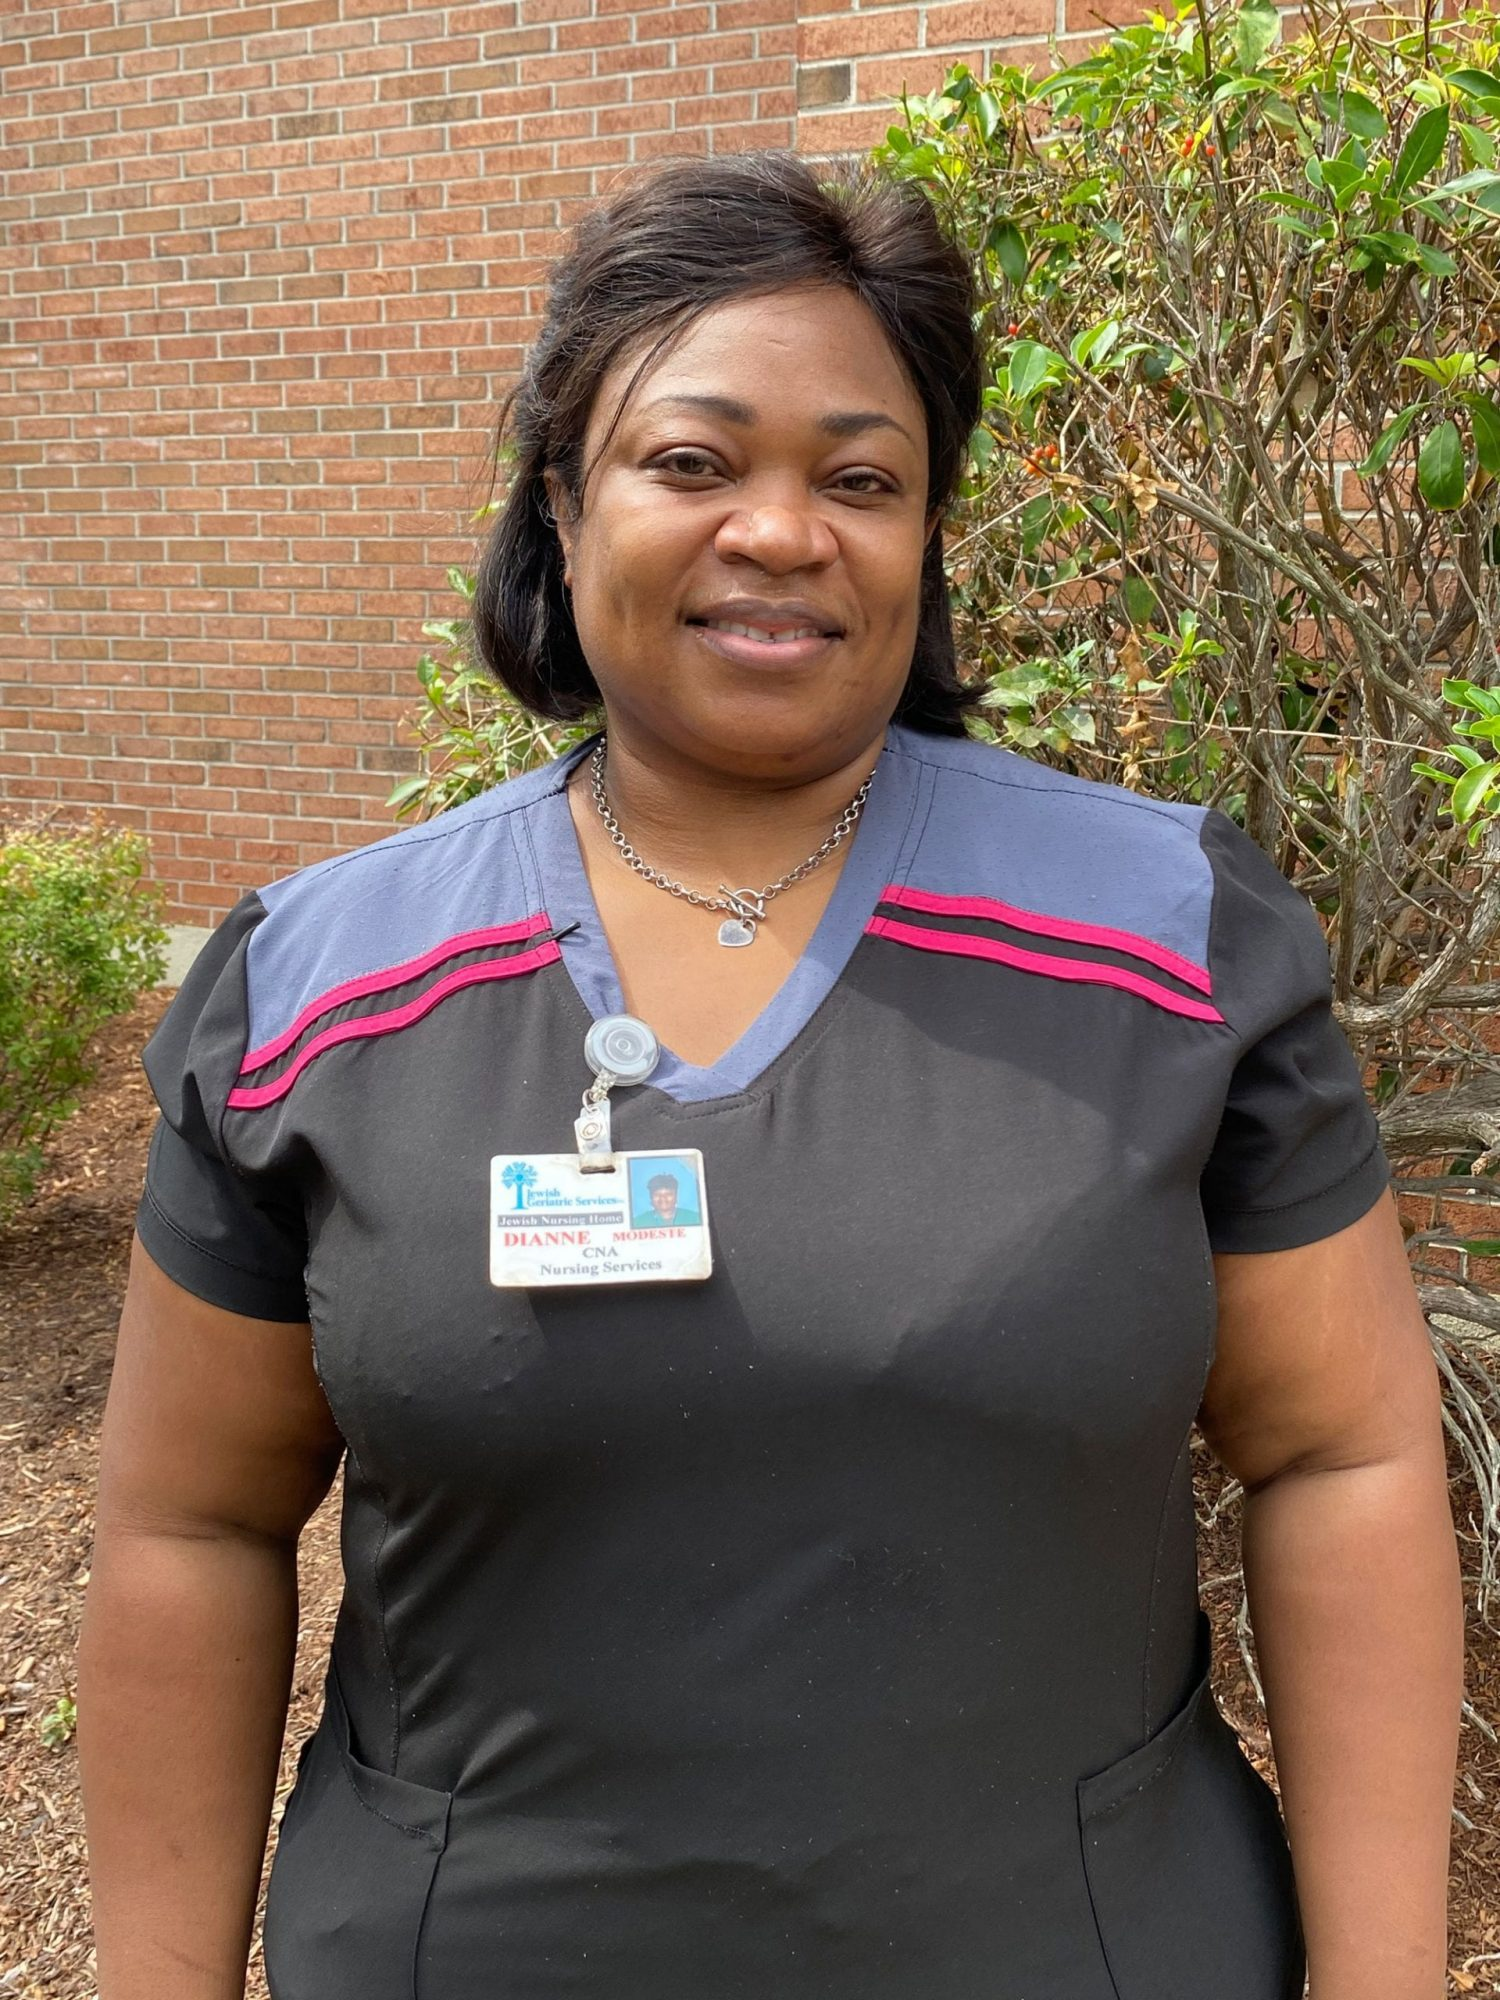 Dianne Modesta, CNA at JGS Lifecare